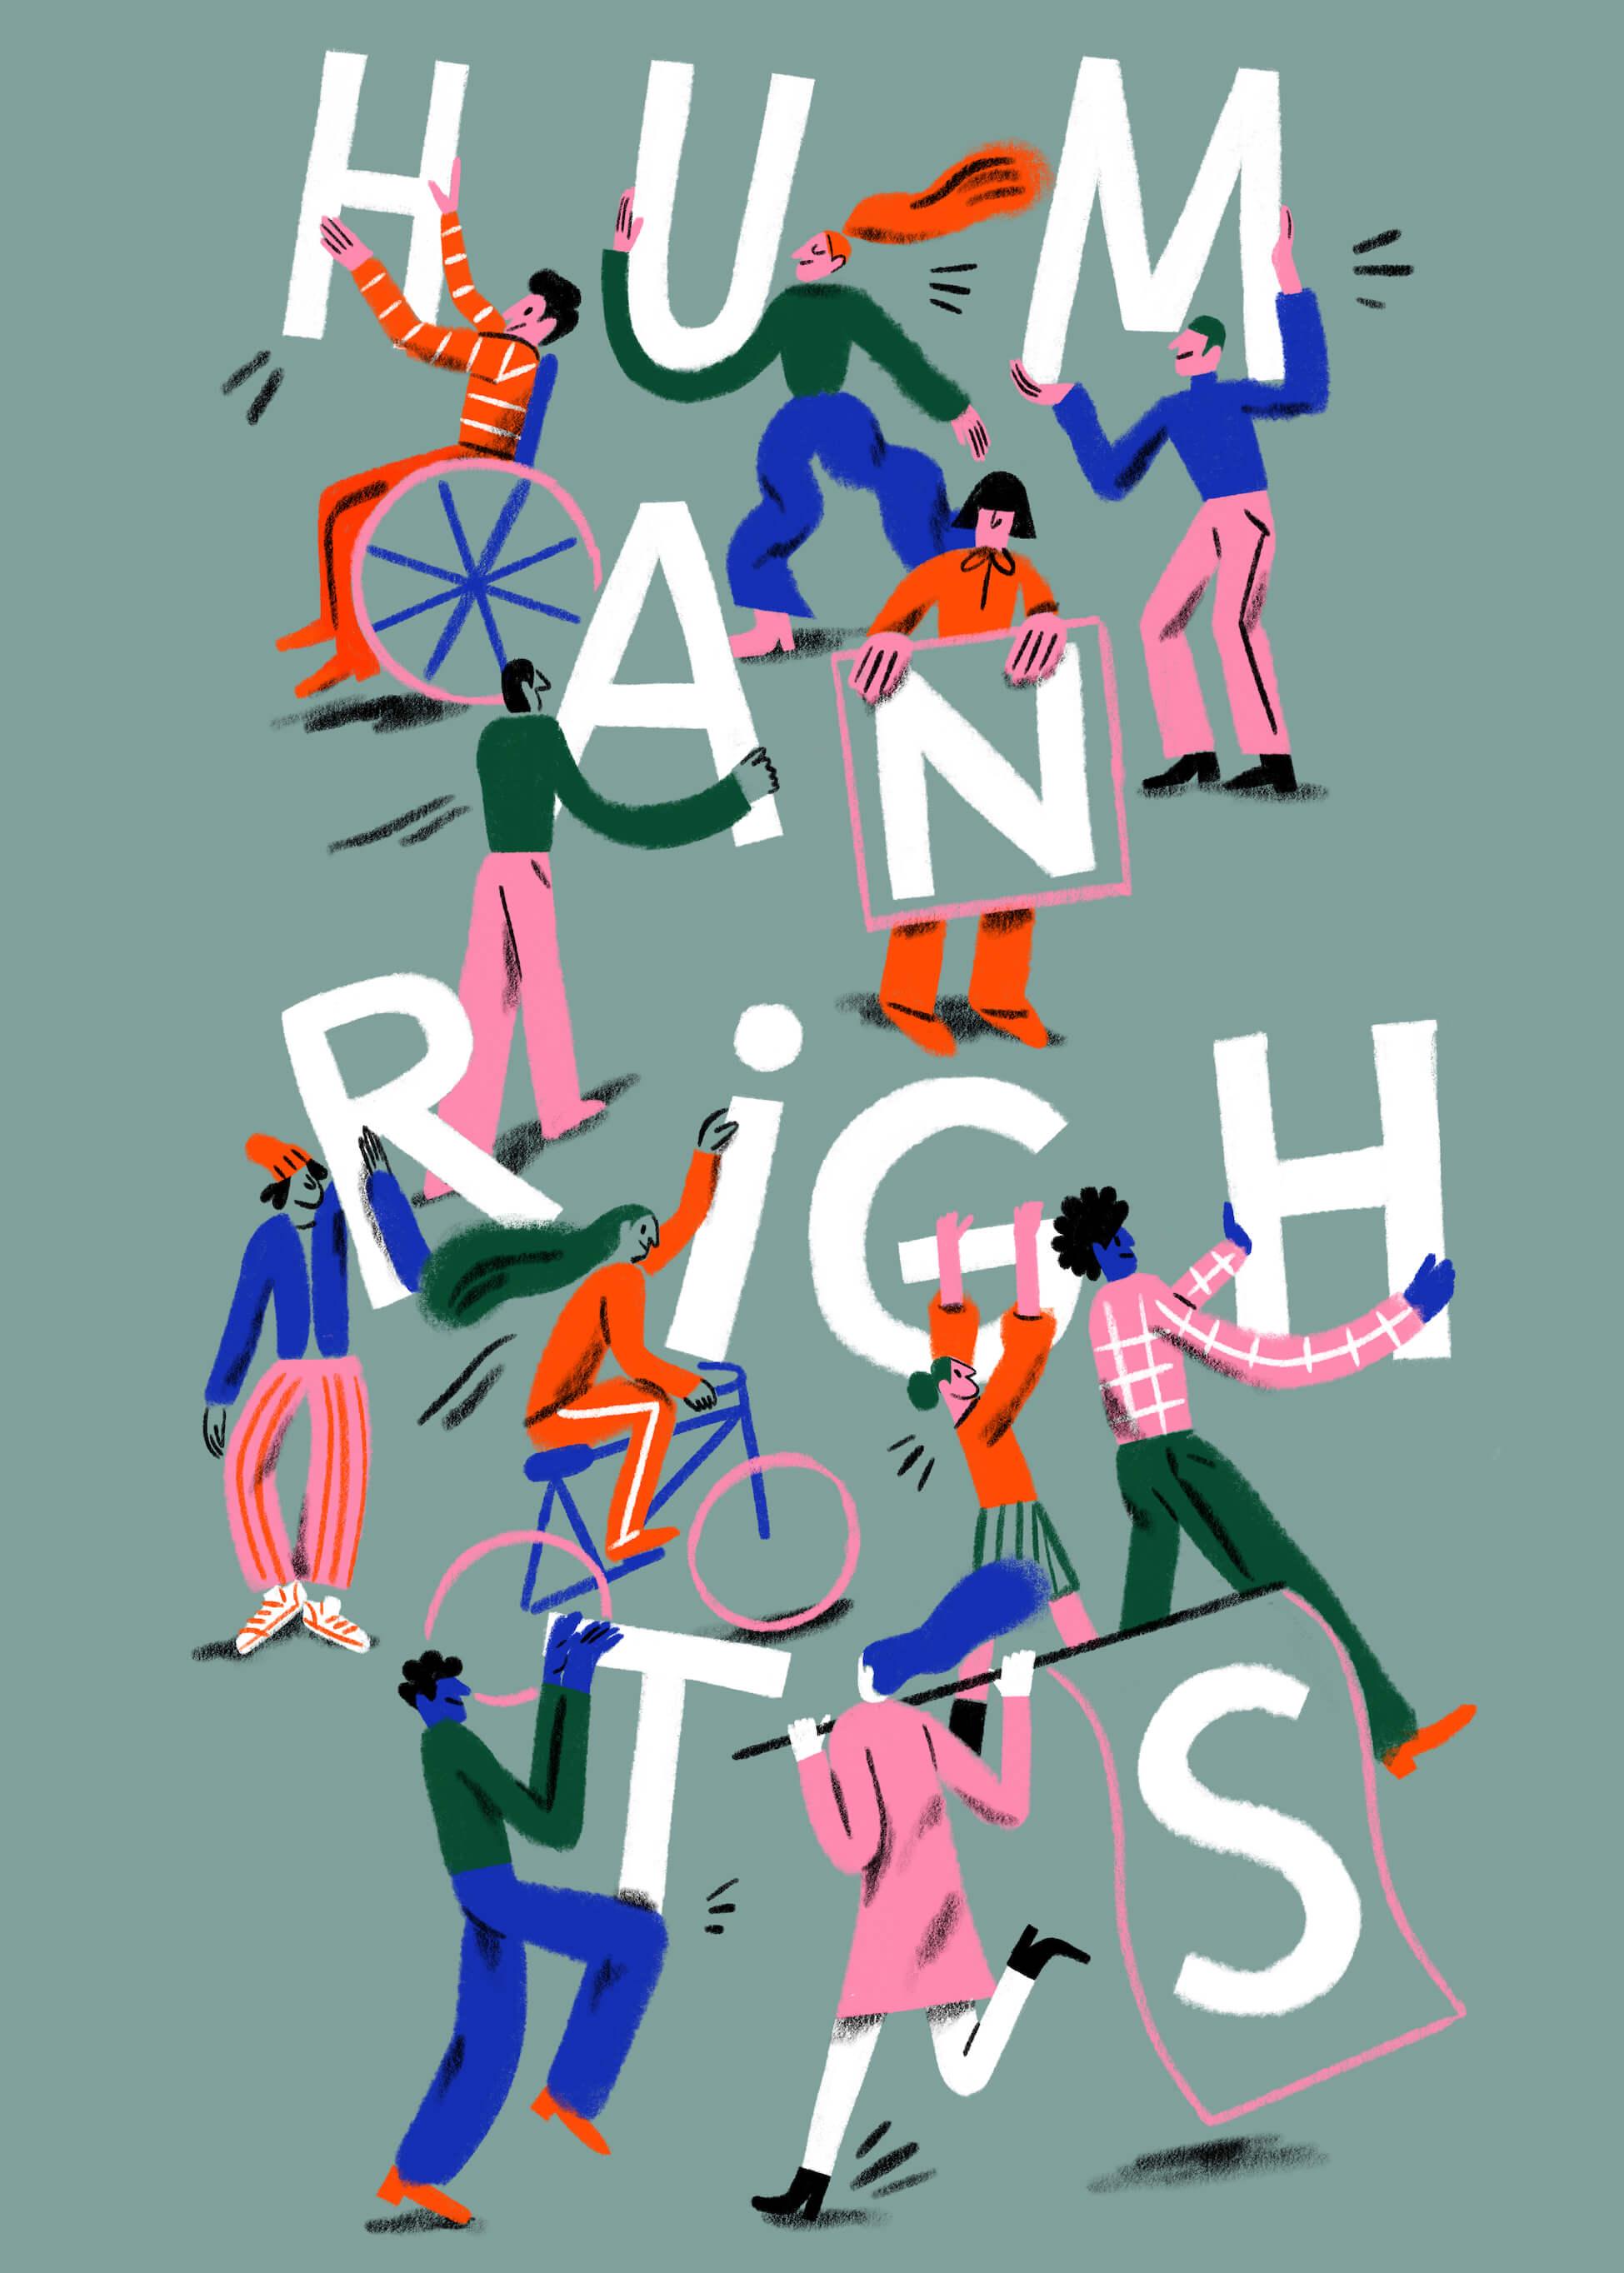 Human Rights For Everyone main image